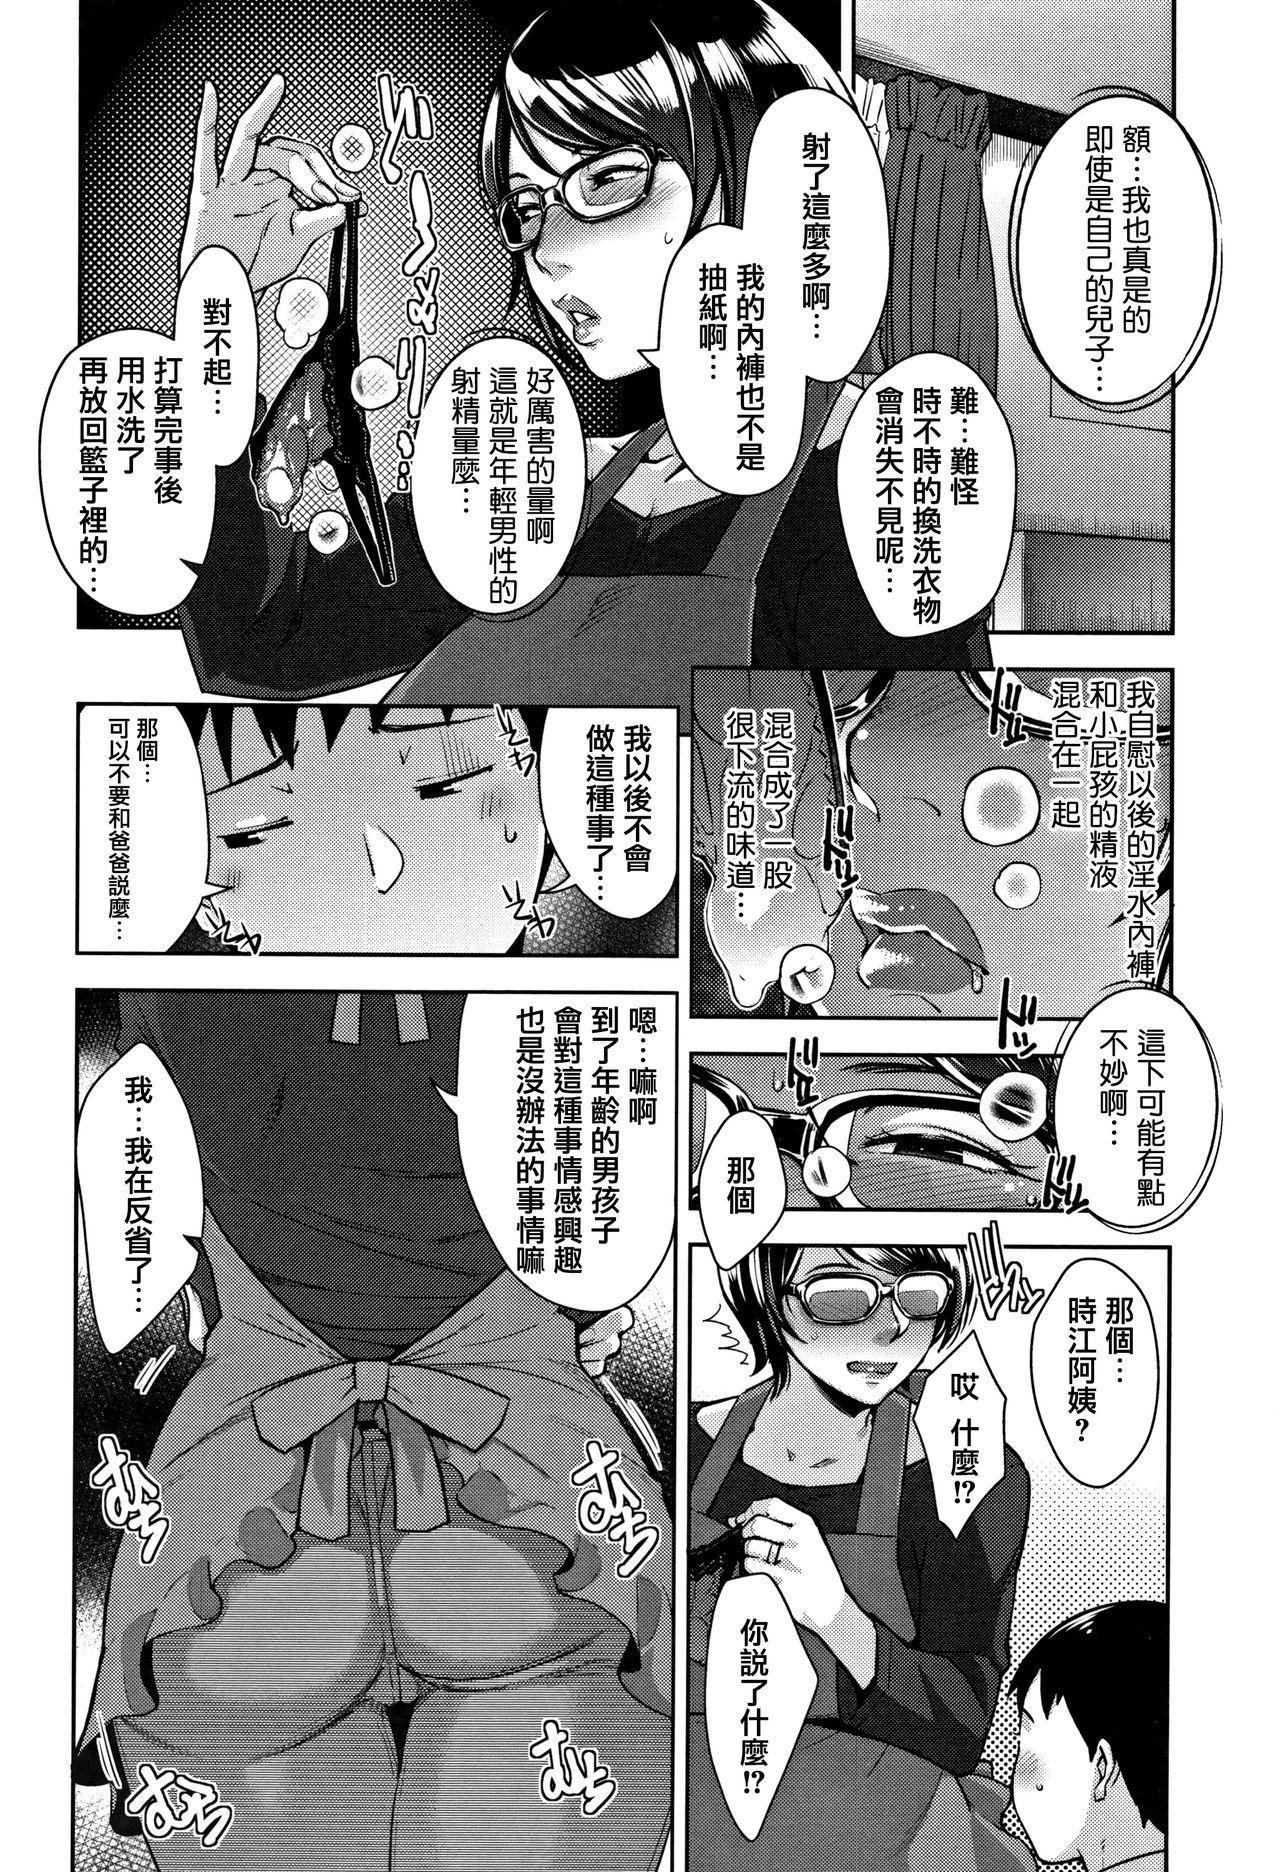 Kanjyuku Chijyo 51